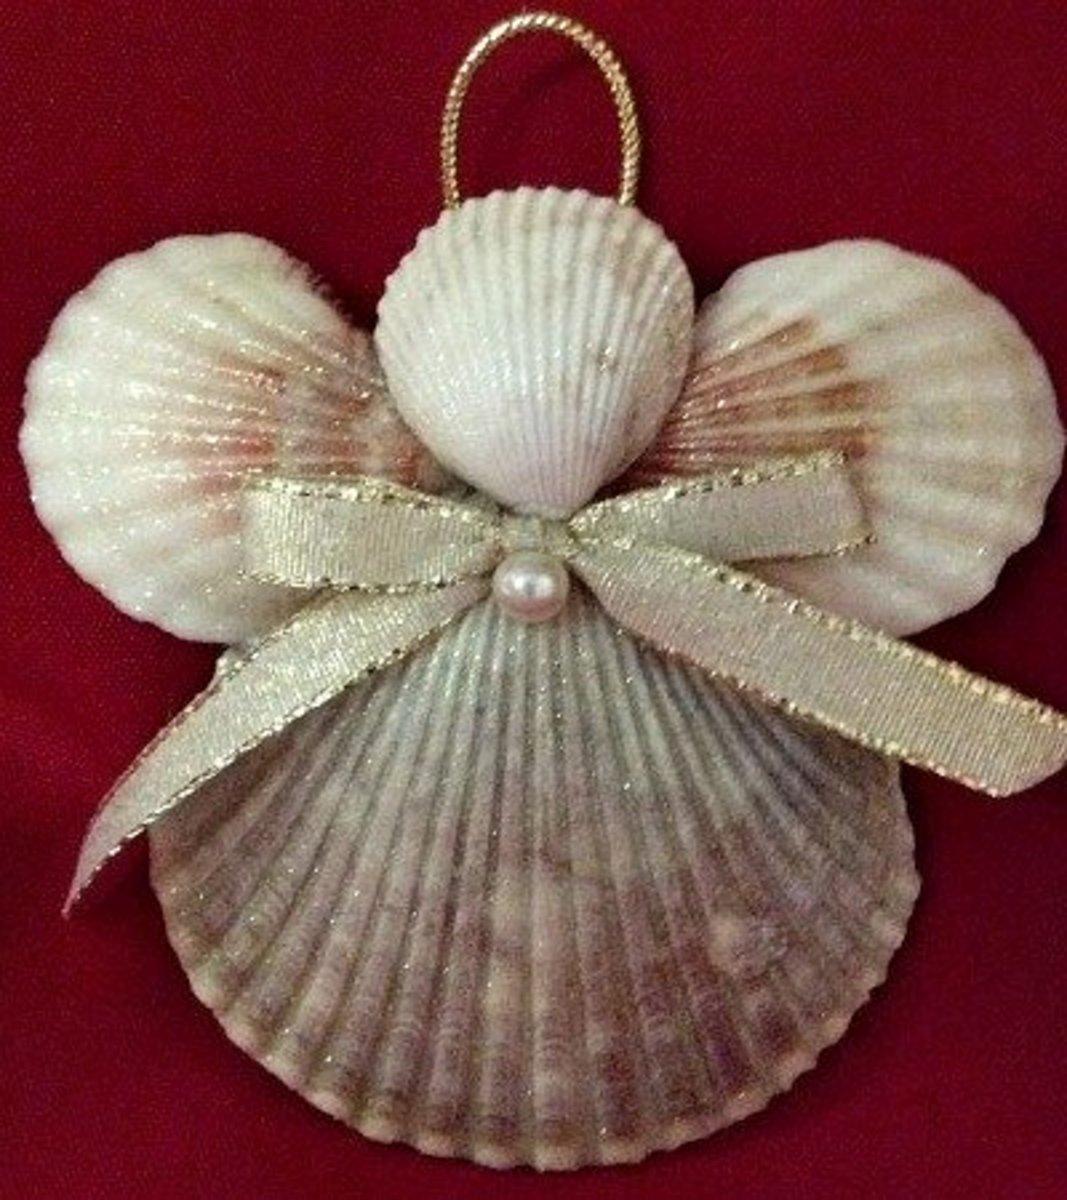 How to make seashell christmas ornaments - Seashell ornaments to make ...